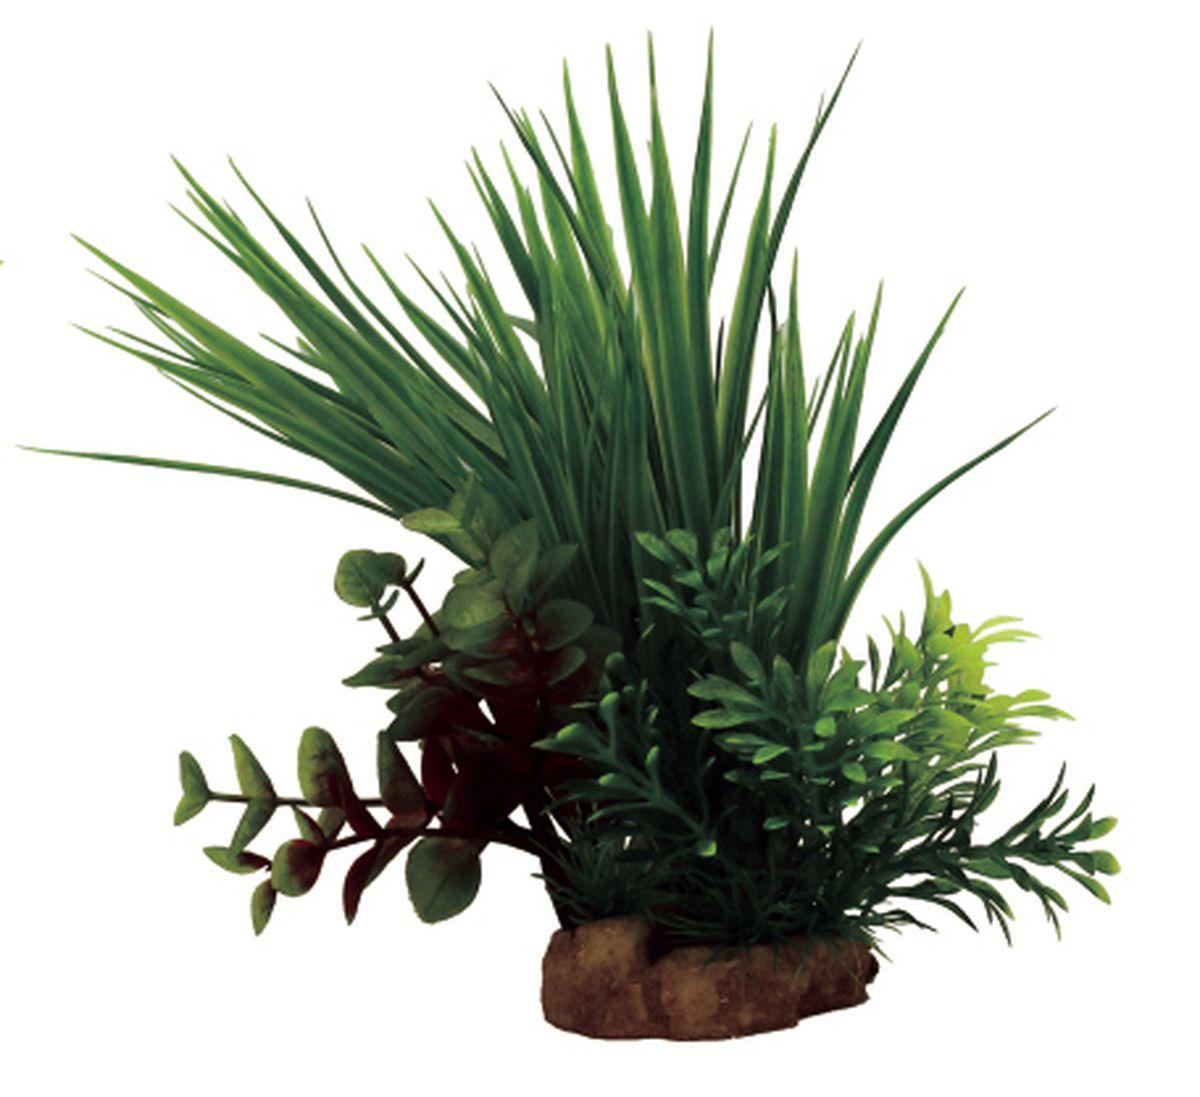 Композиция из растений для аквариума ArtUniq Акорус, 14 x 13 x 22 смART-1130804Композиция из растений для аквариума ArtUniq Акорус, 14 x 13 x 22 см